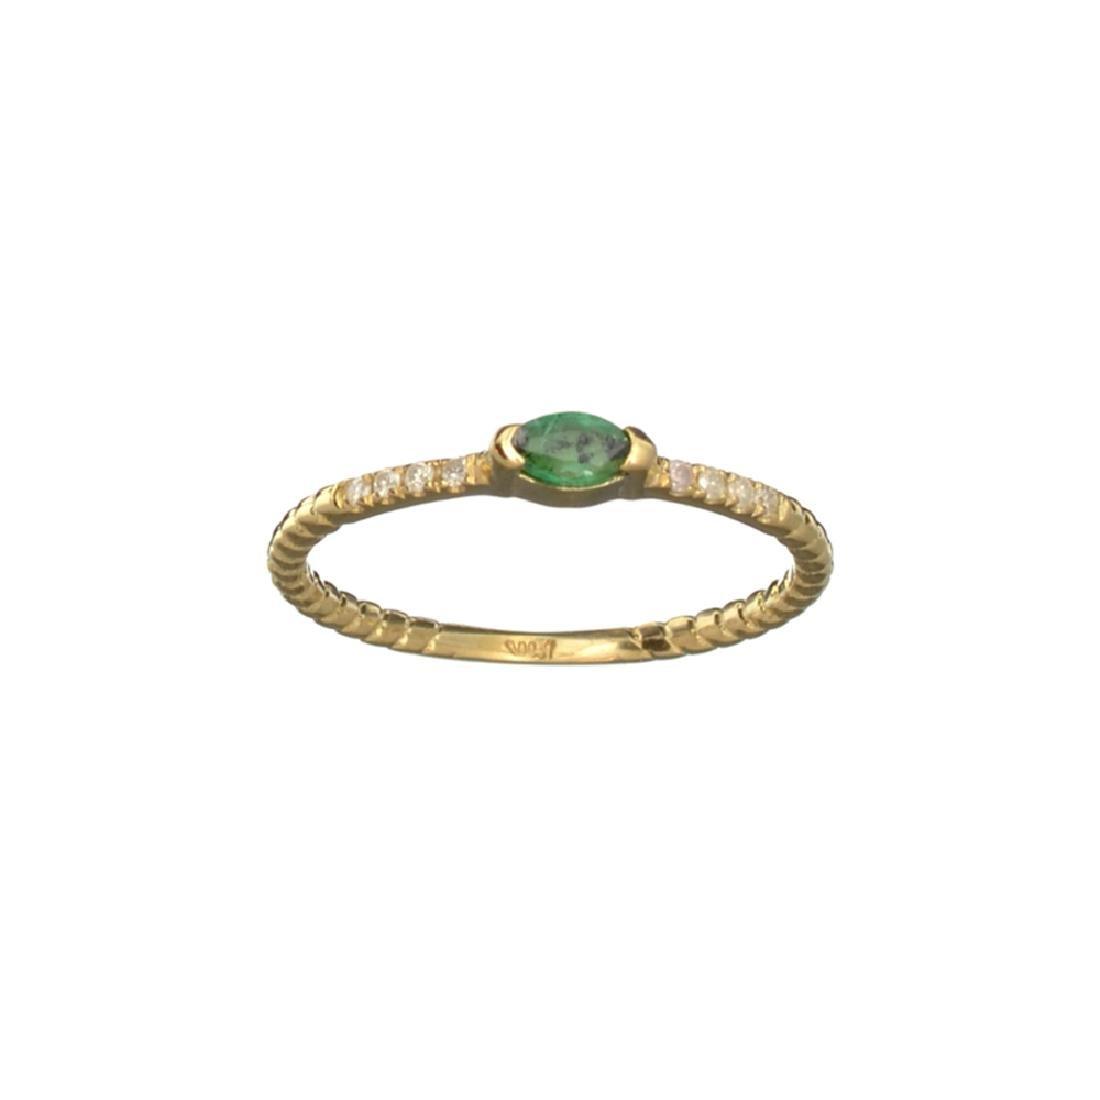 APP: 0.6k Fine Jewelry 14KT Gold, 0.15CT Green Emerald